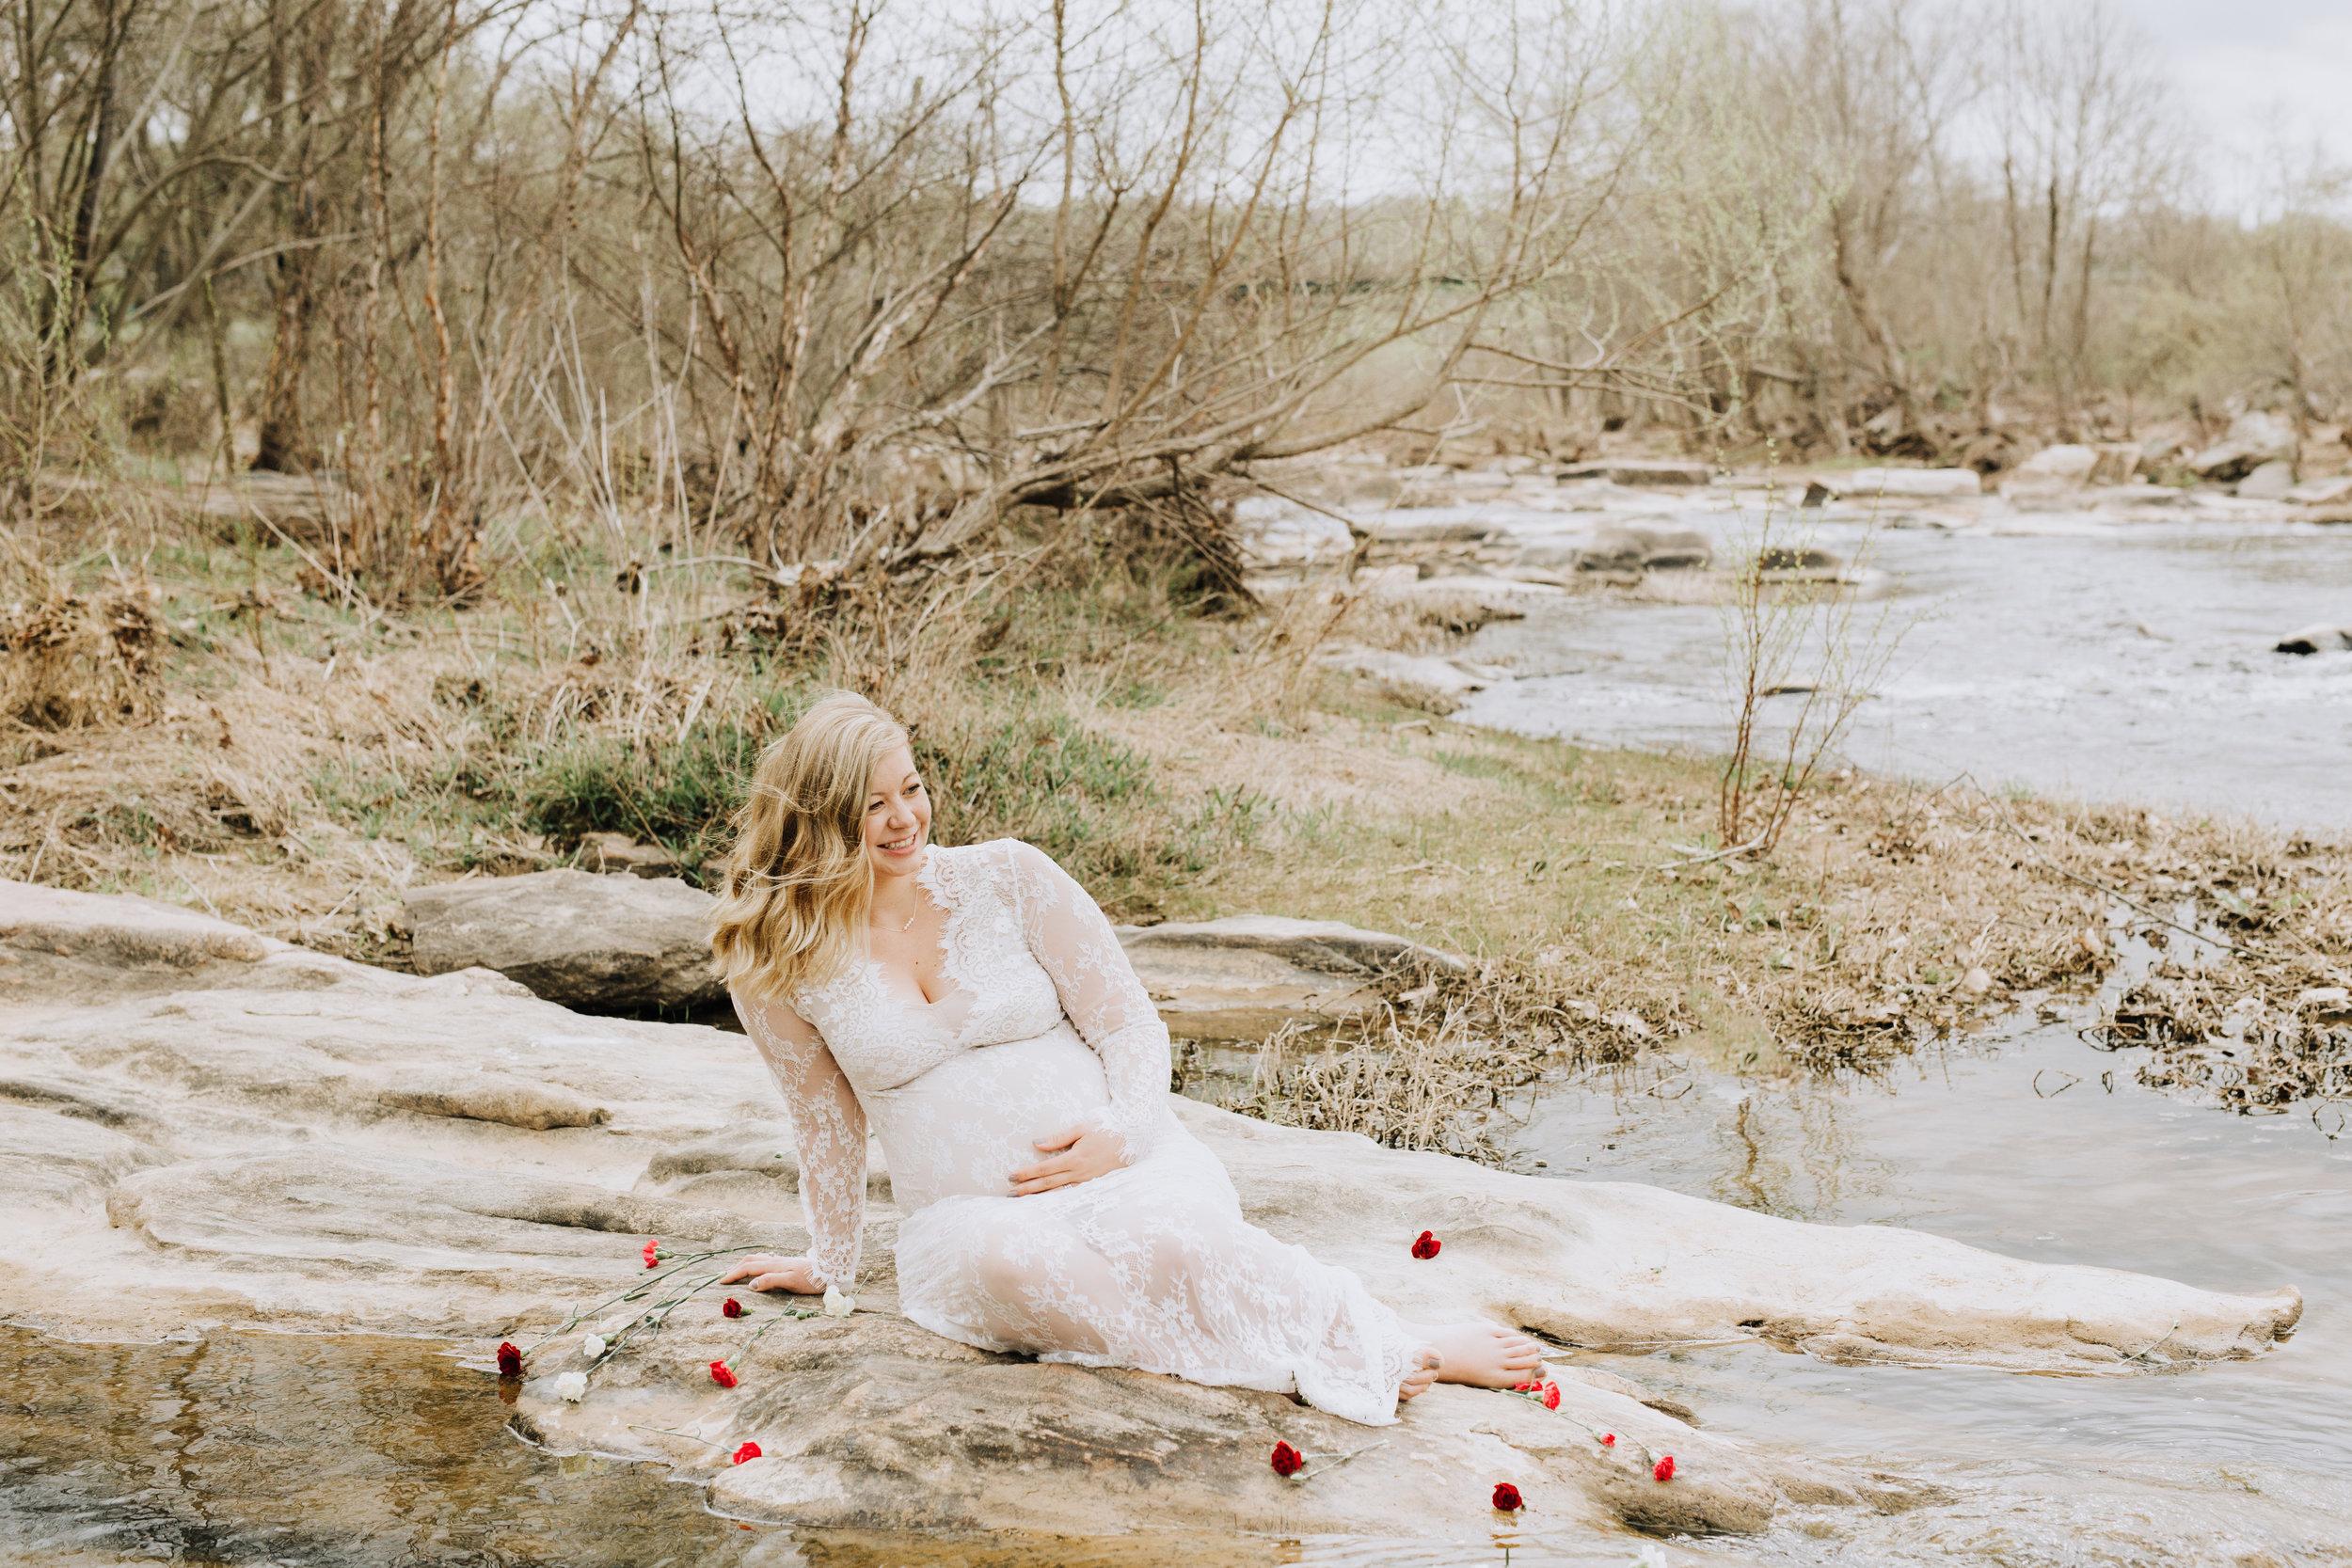 Fredericksburg_Virginia_Maternity_Photographer_Riverside (36).jpg